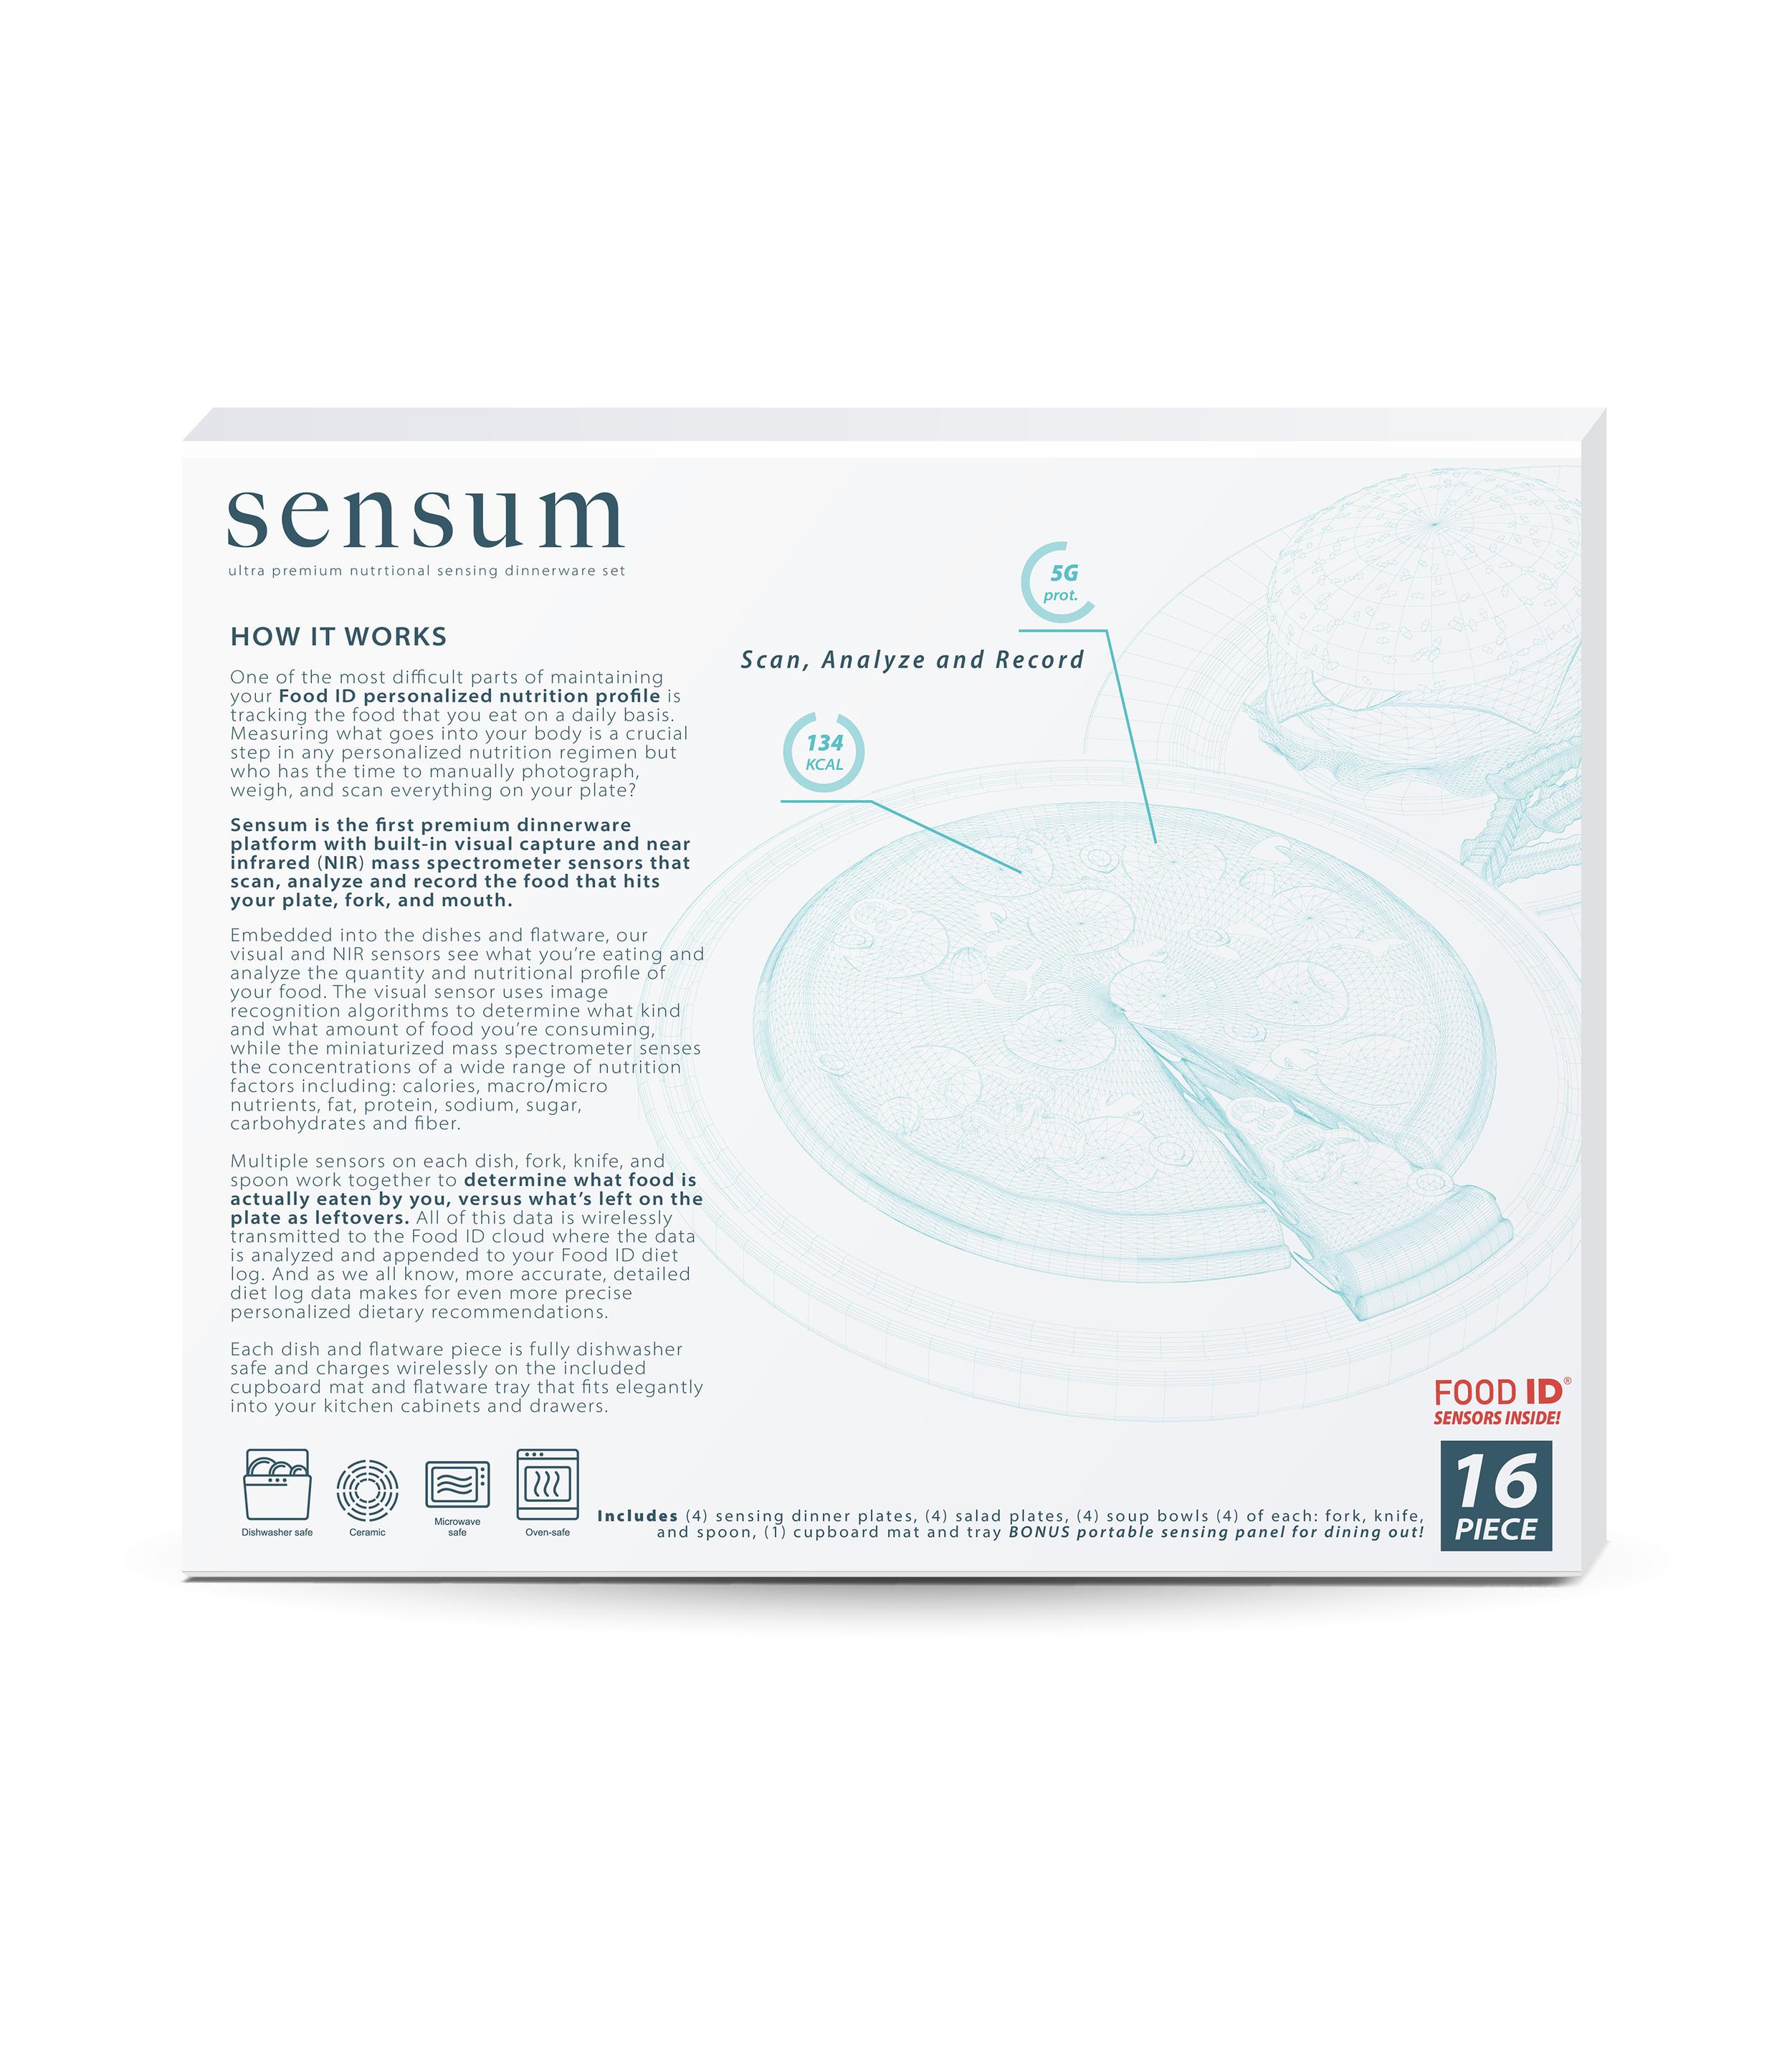 Sensum-Back-sized.png